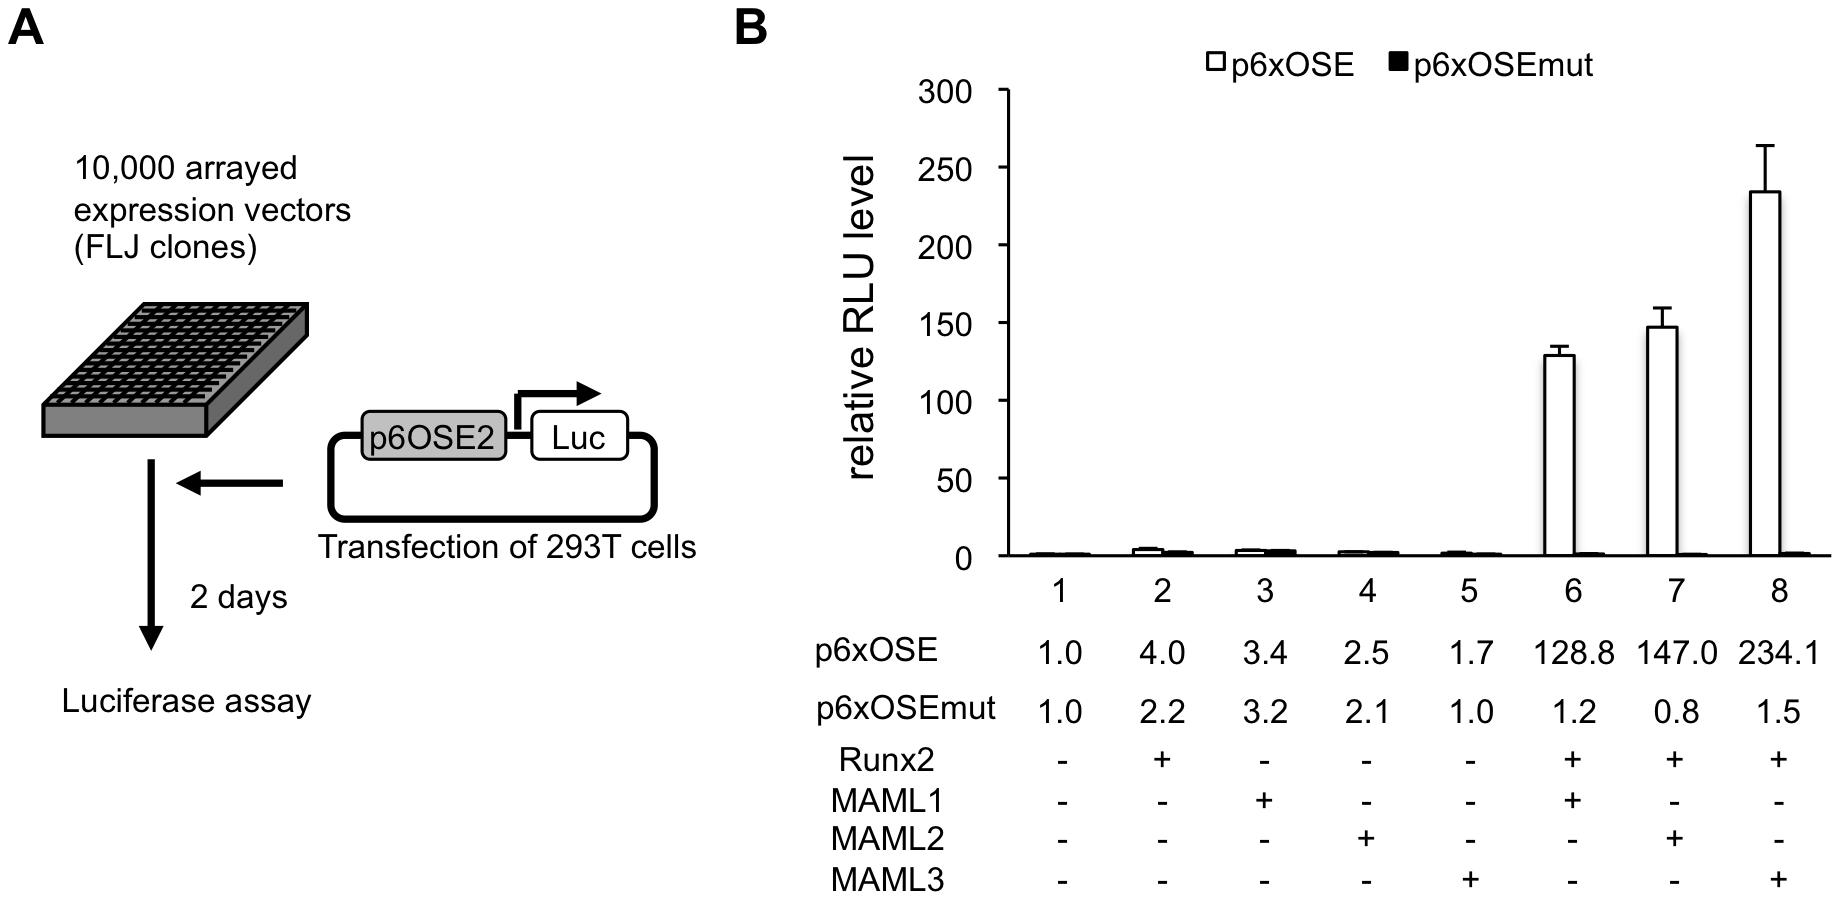 MAML1 enhances the transcriptional activity of Runx2.